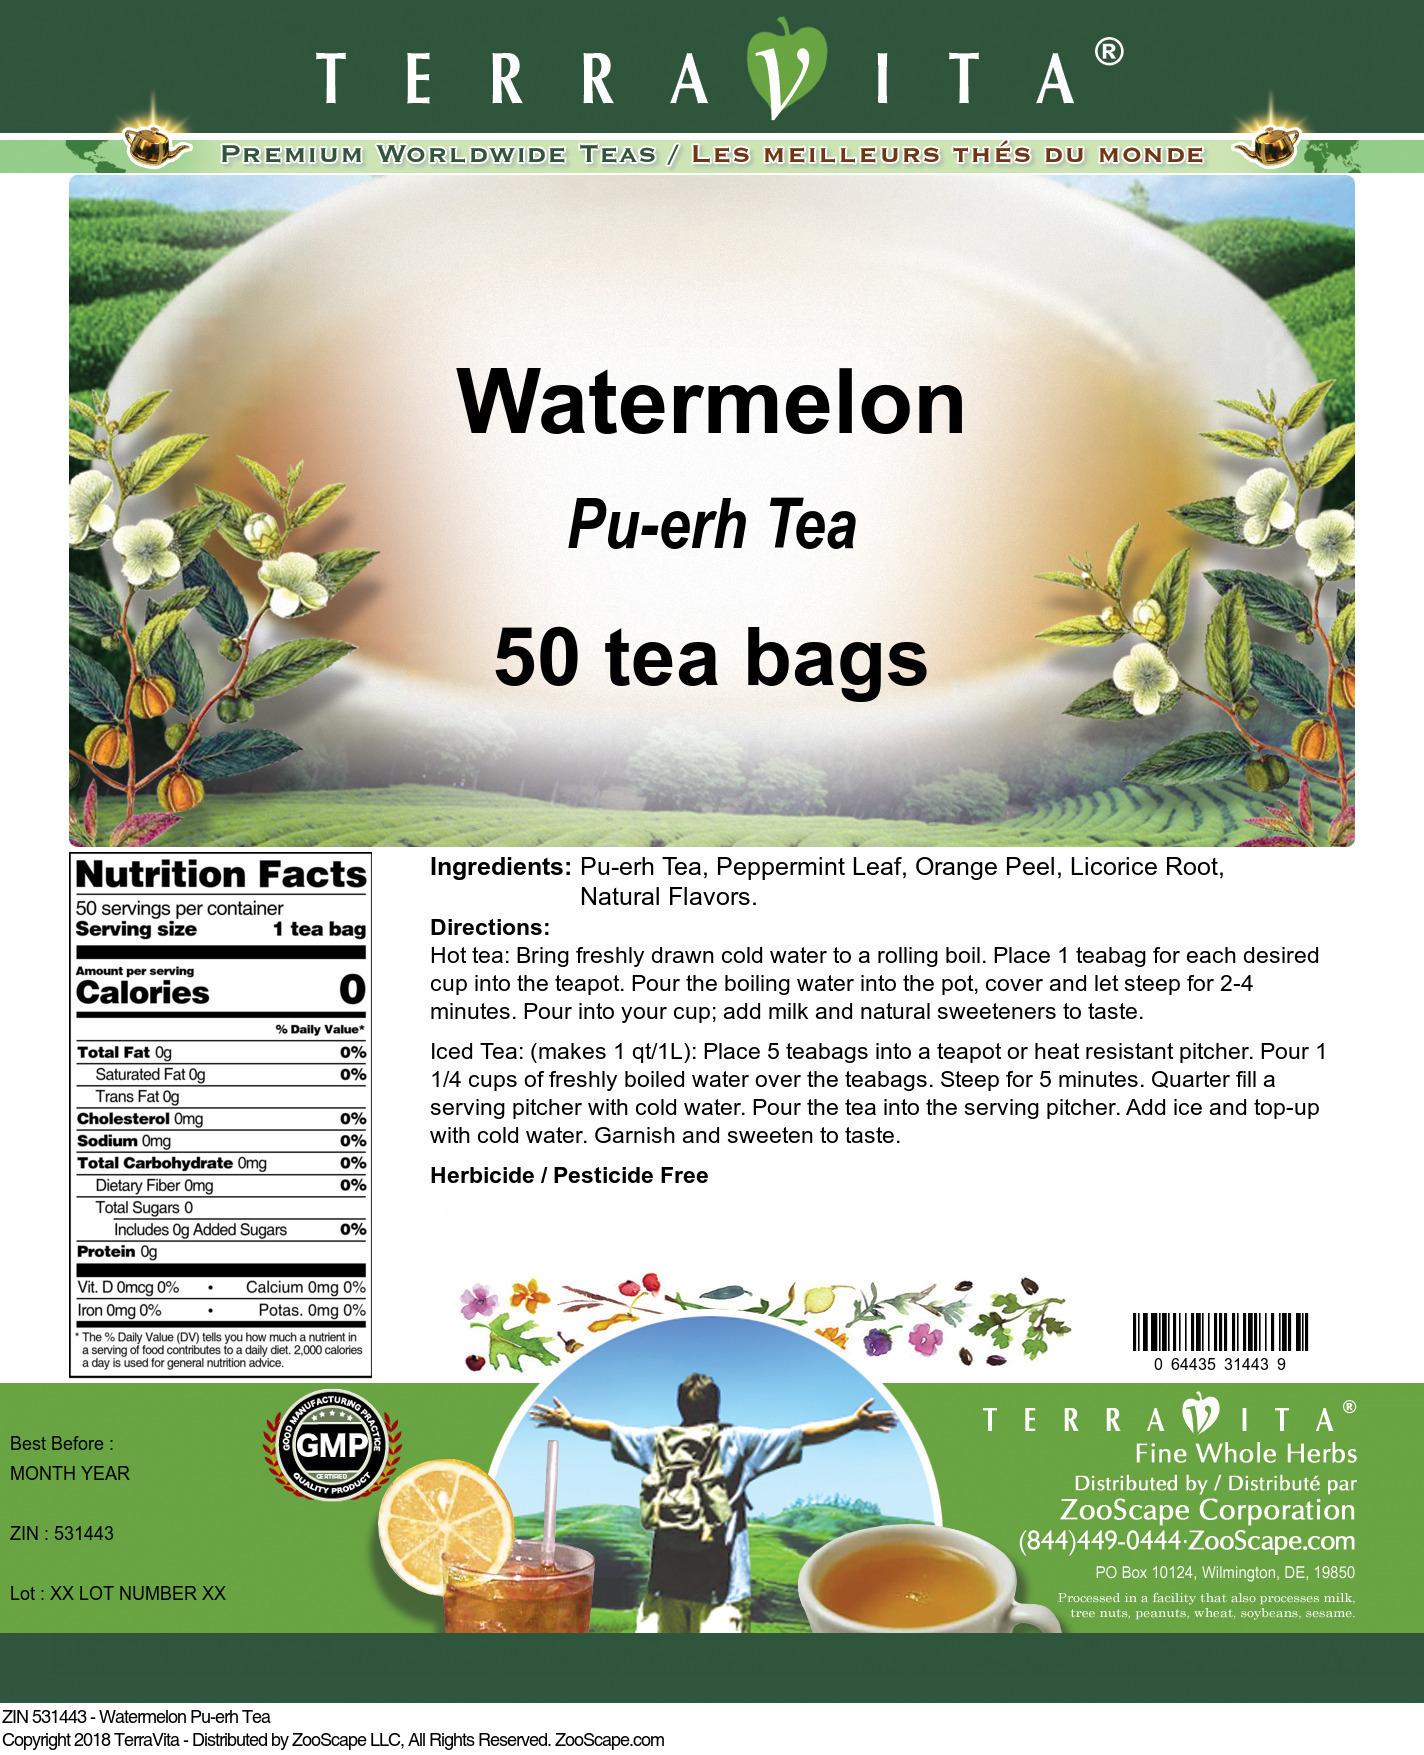 Watermelon Pu-erh Tea